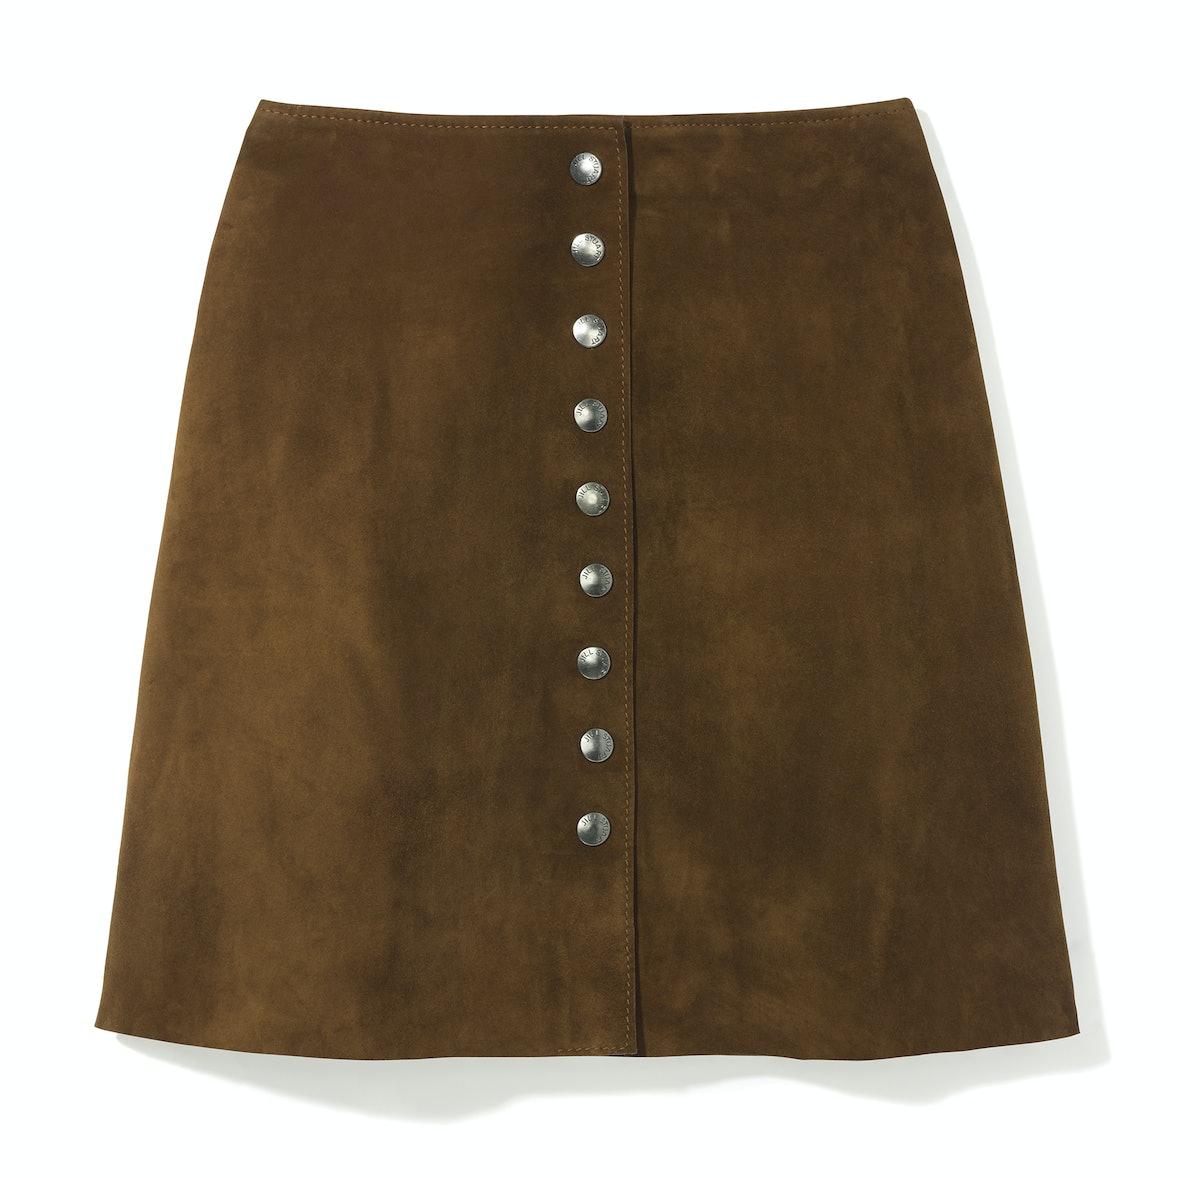 Jill Stuart skirt